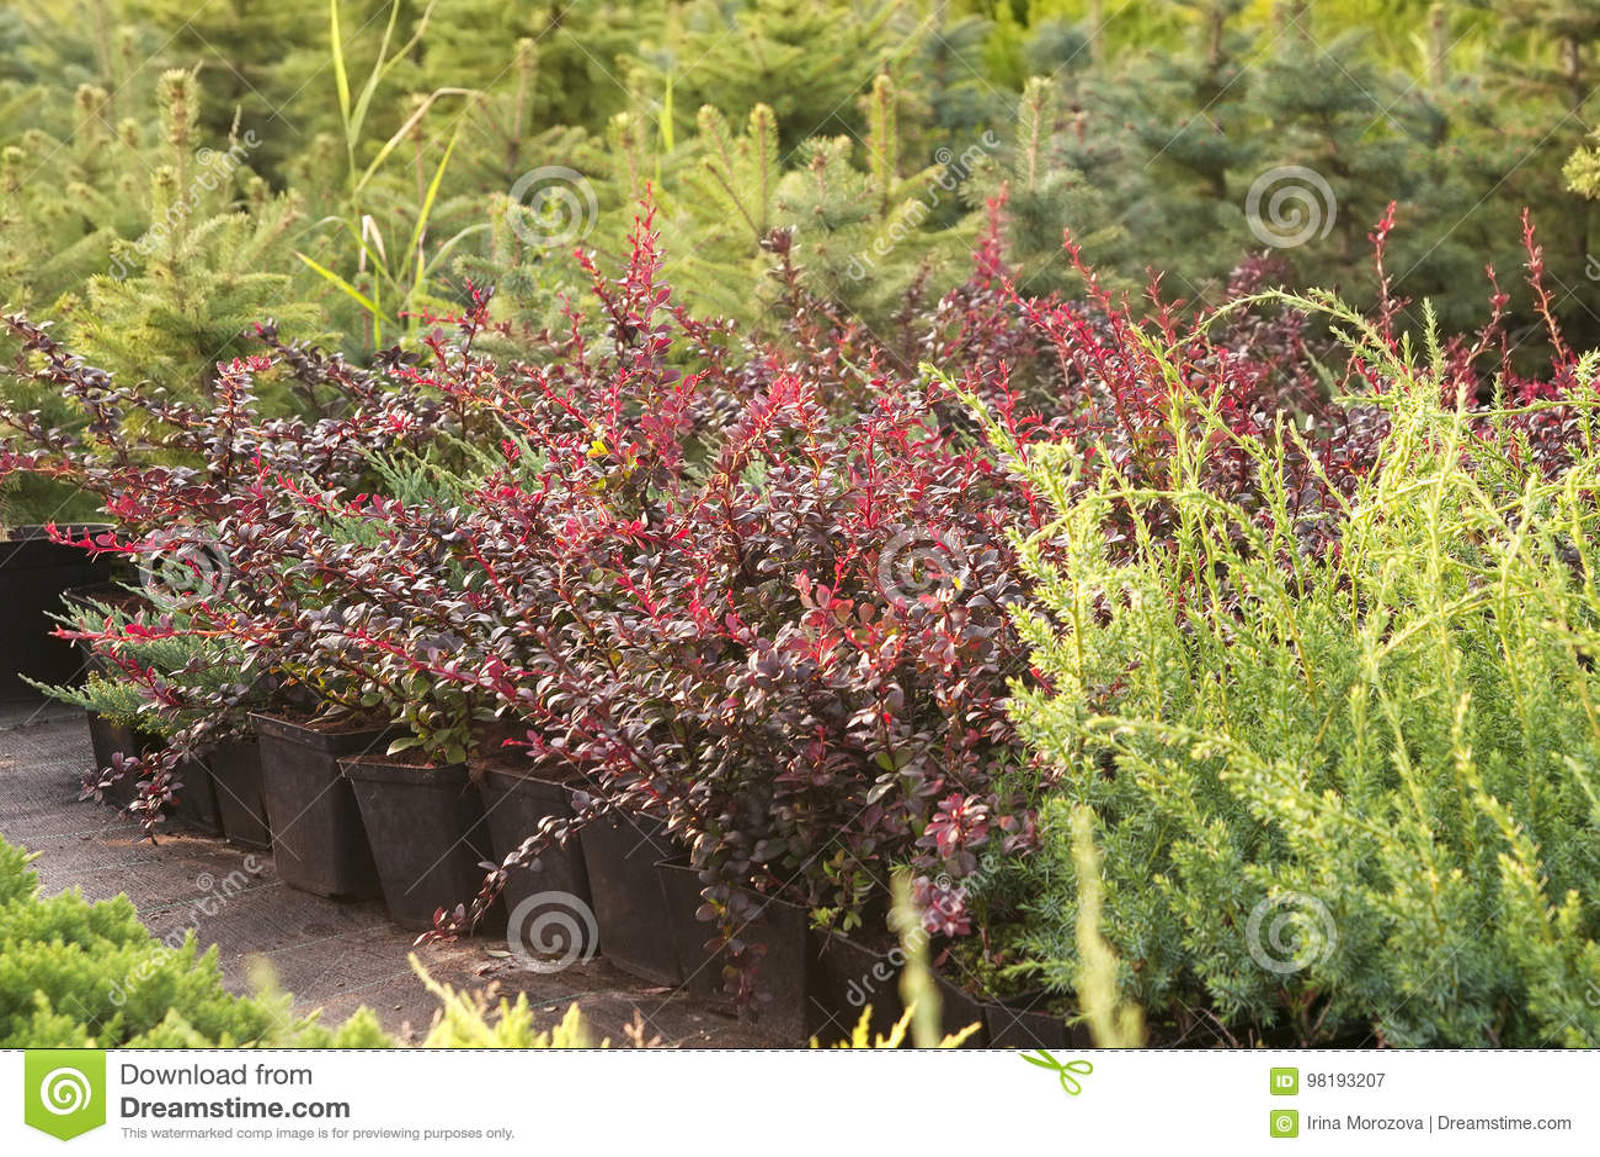 Download Coniferous Plants In Garden Pots In The Nursery Stock Image    Image Of Pots,